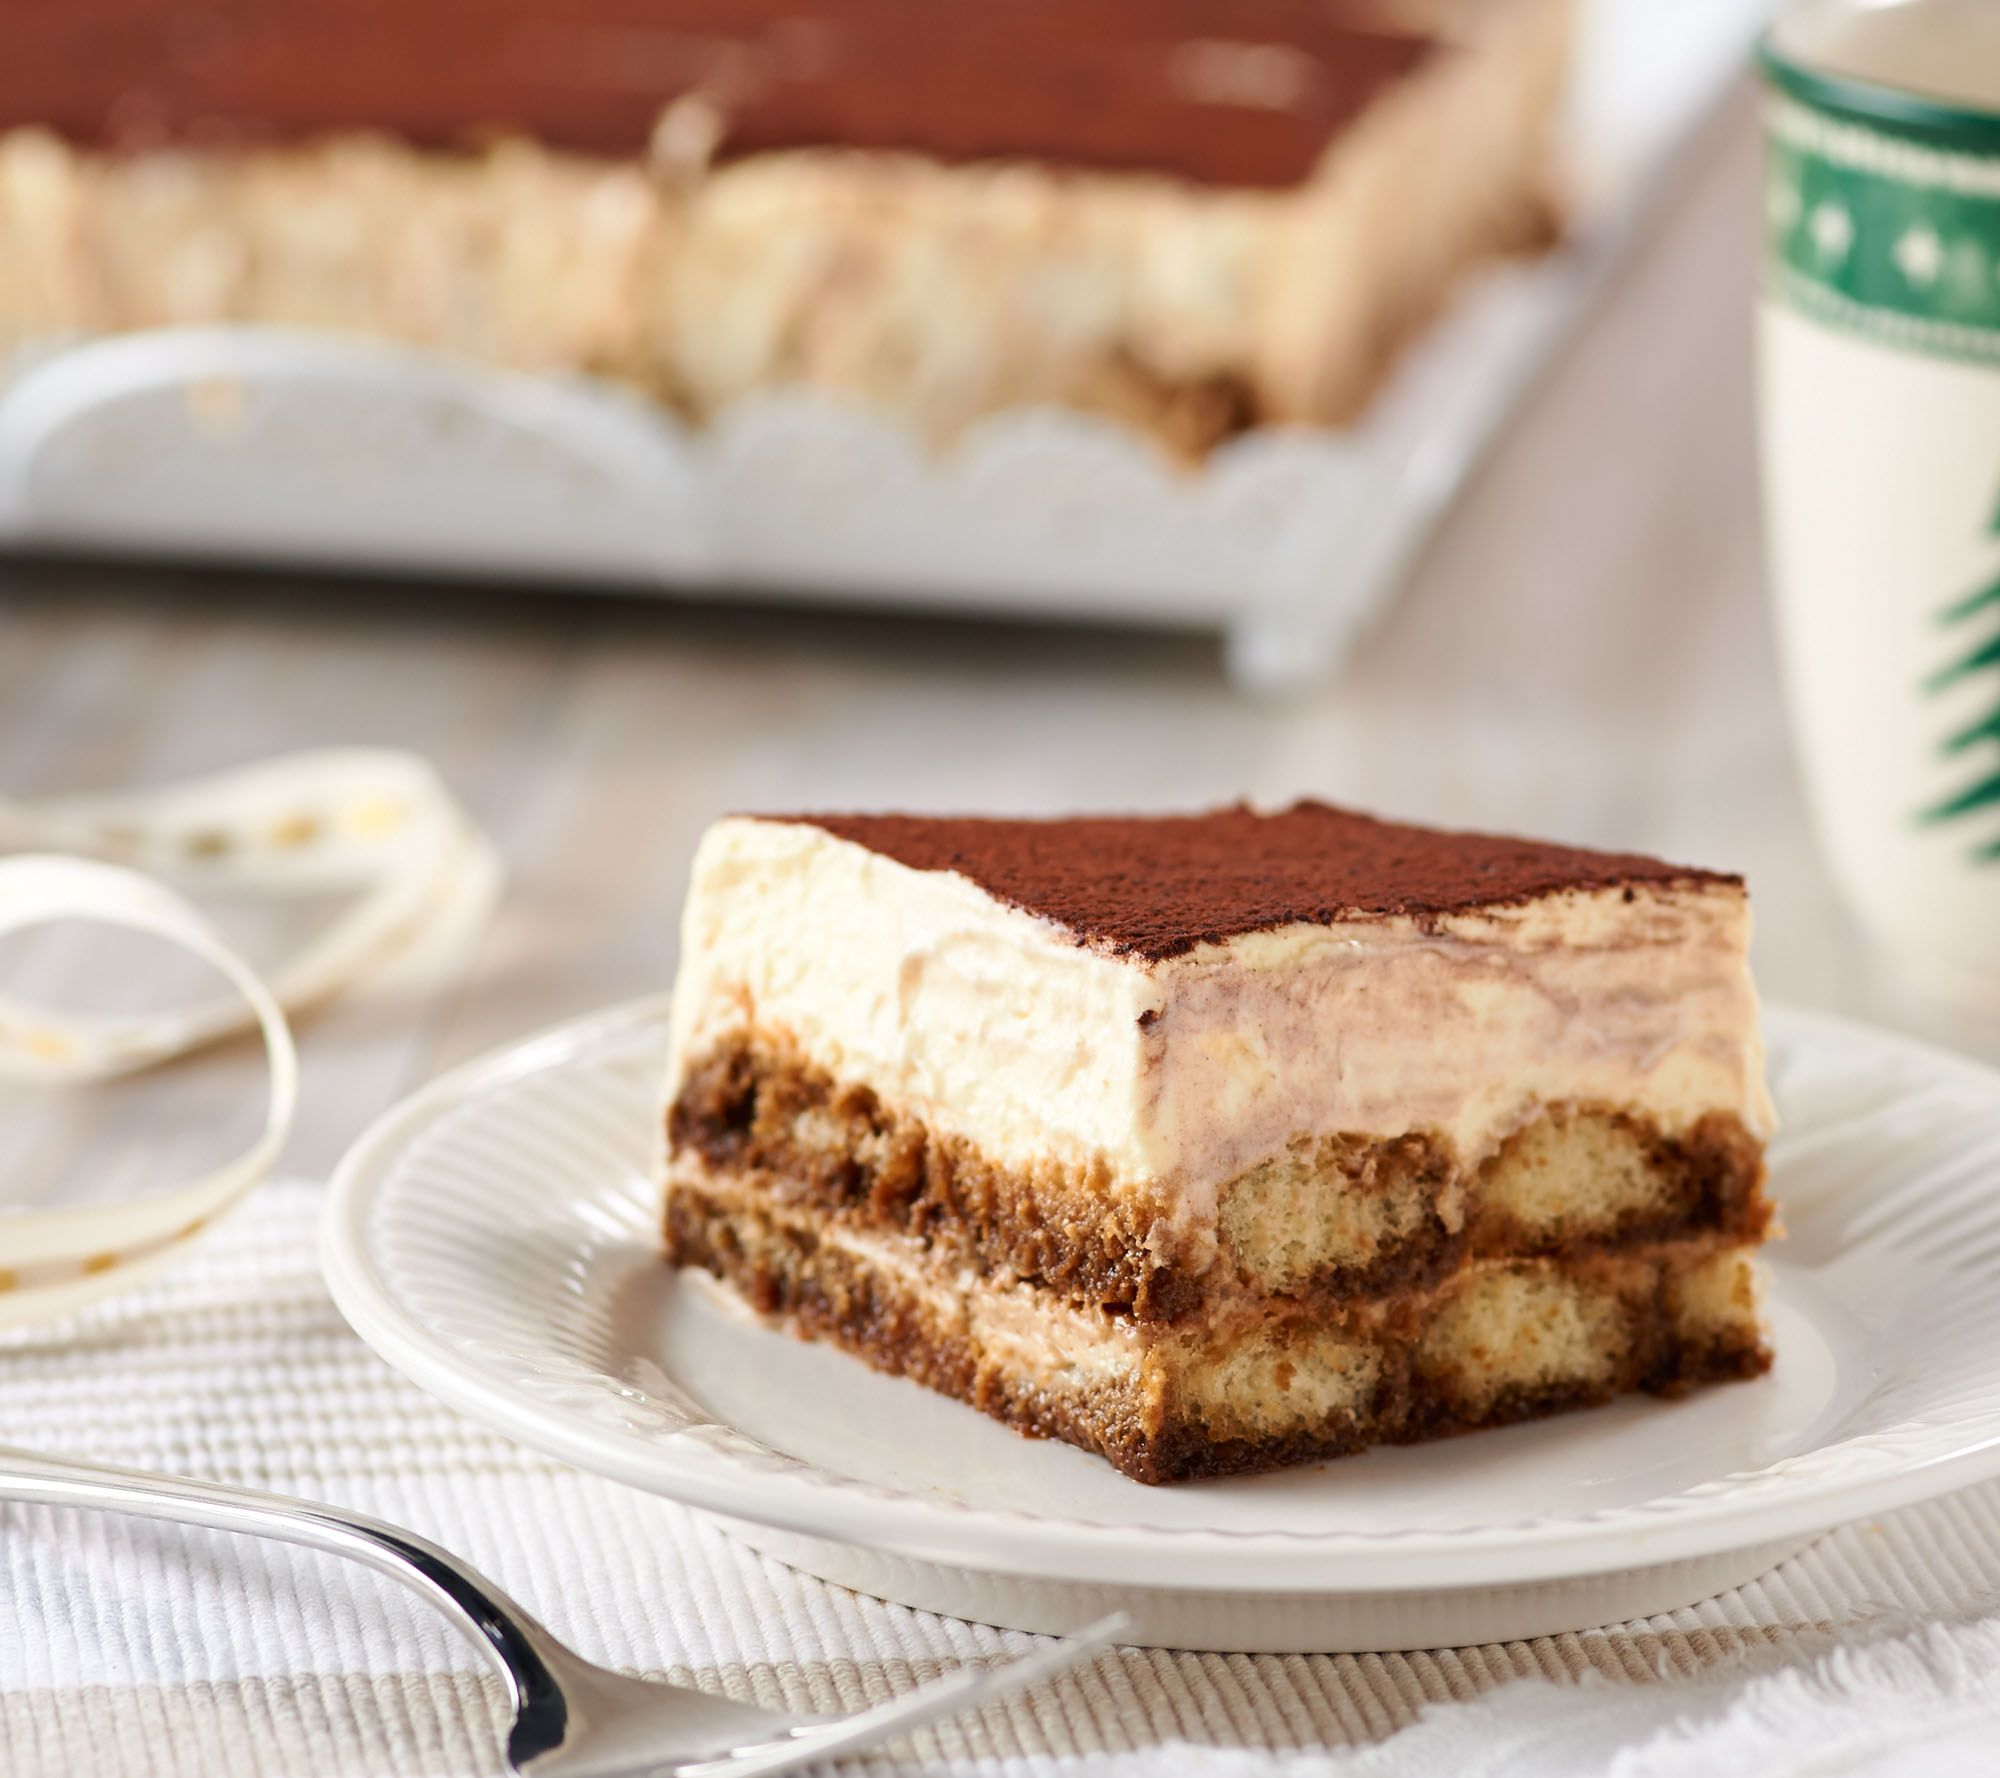 Delizioso Desserts 5 lb Tiramisu Cake Page 1 QVCcom